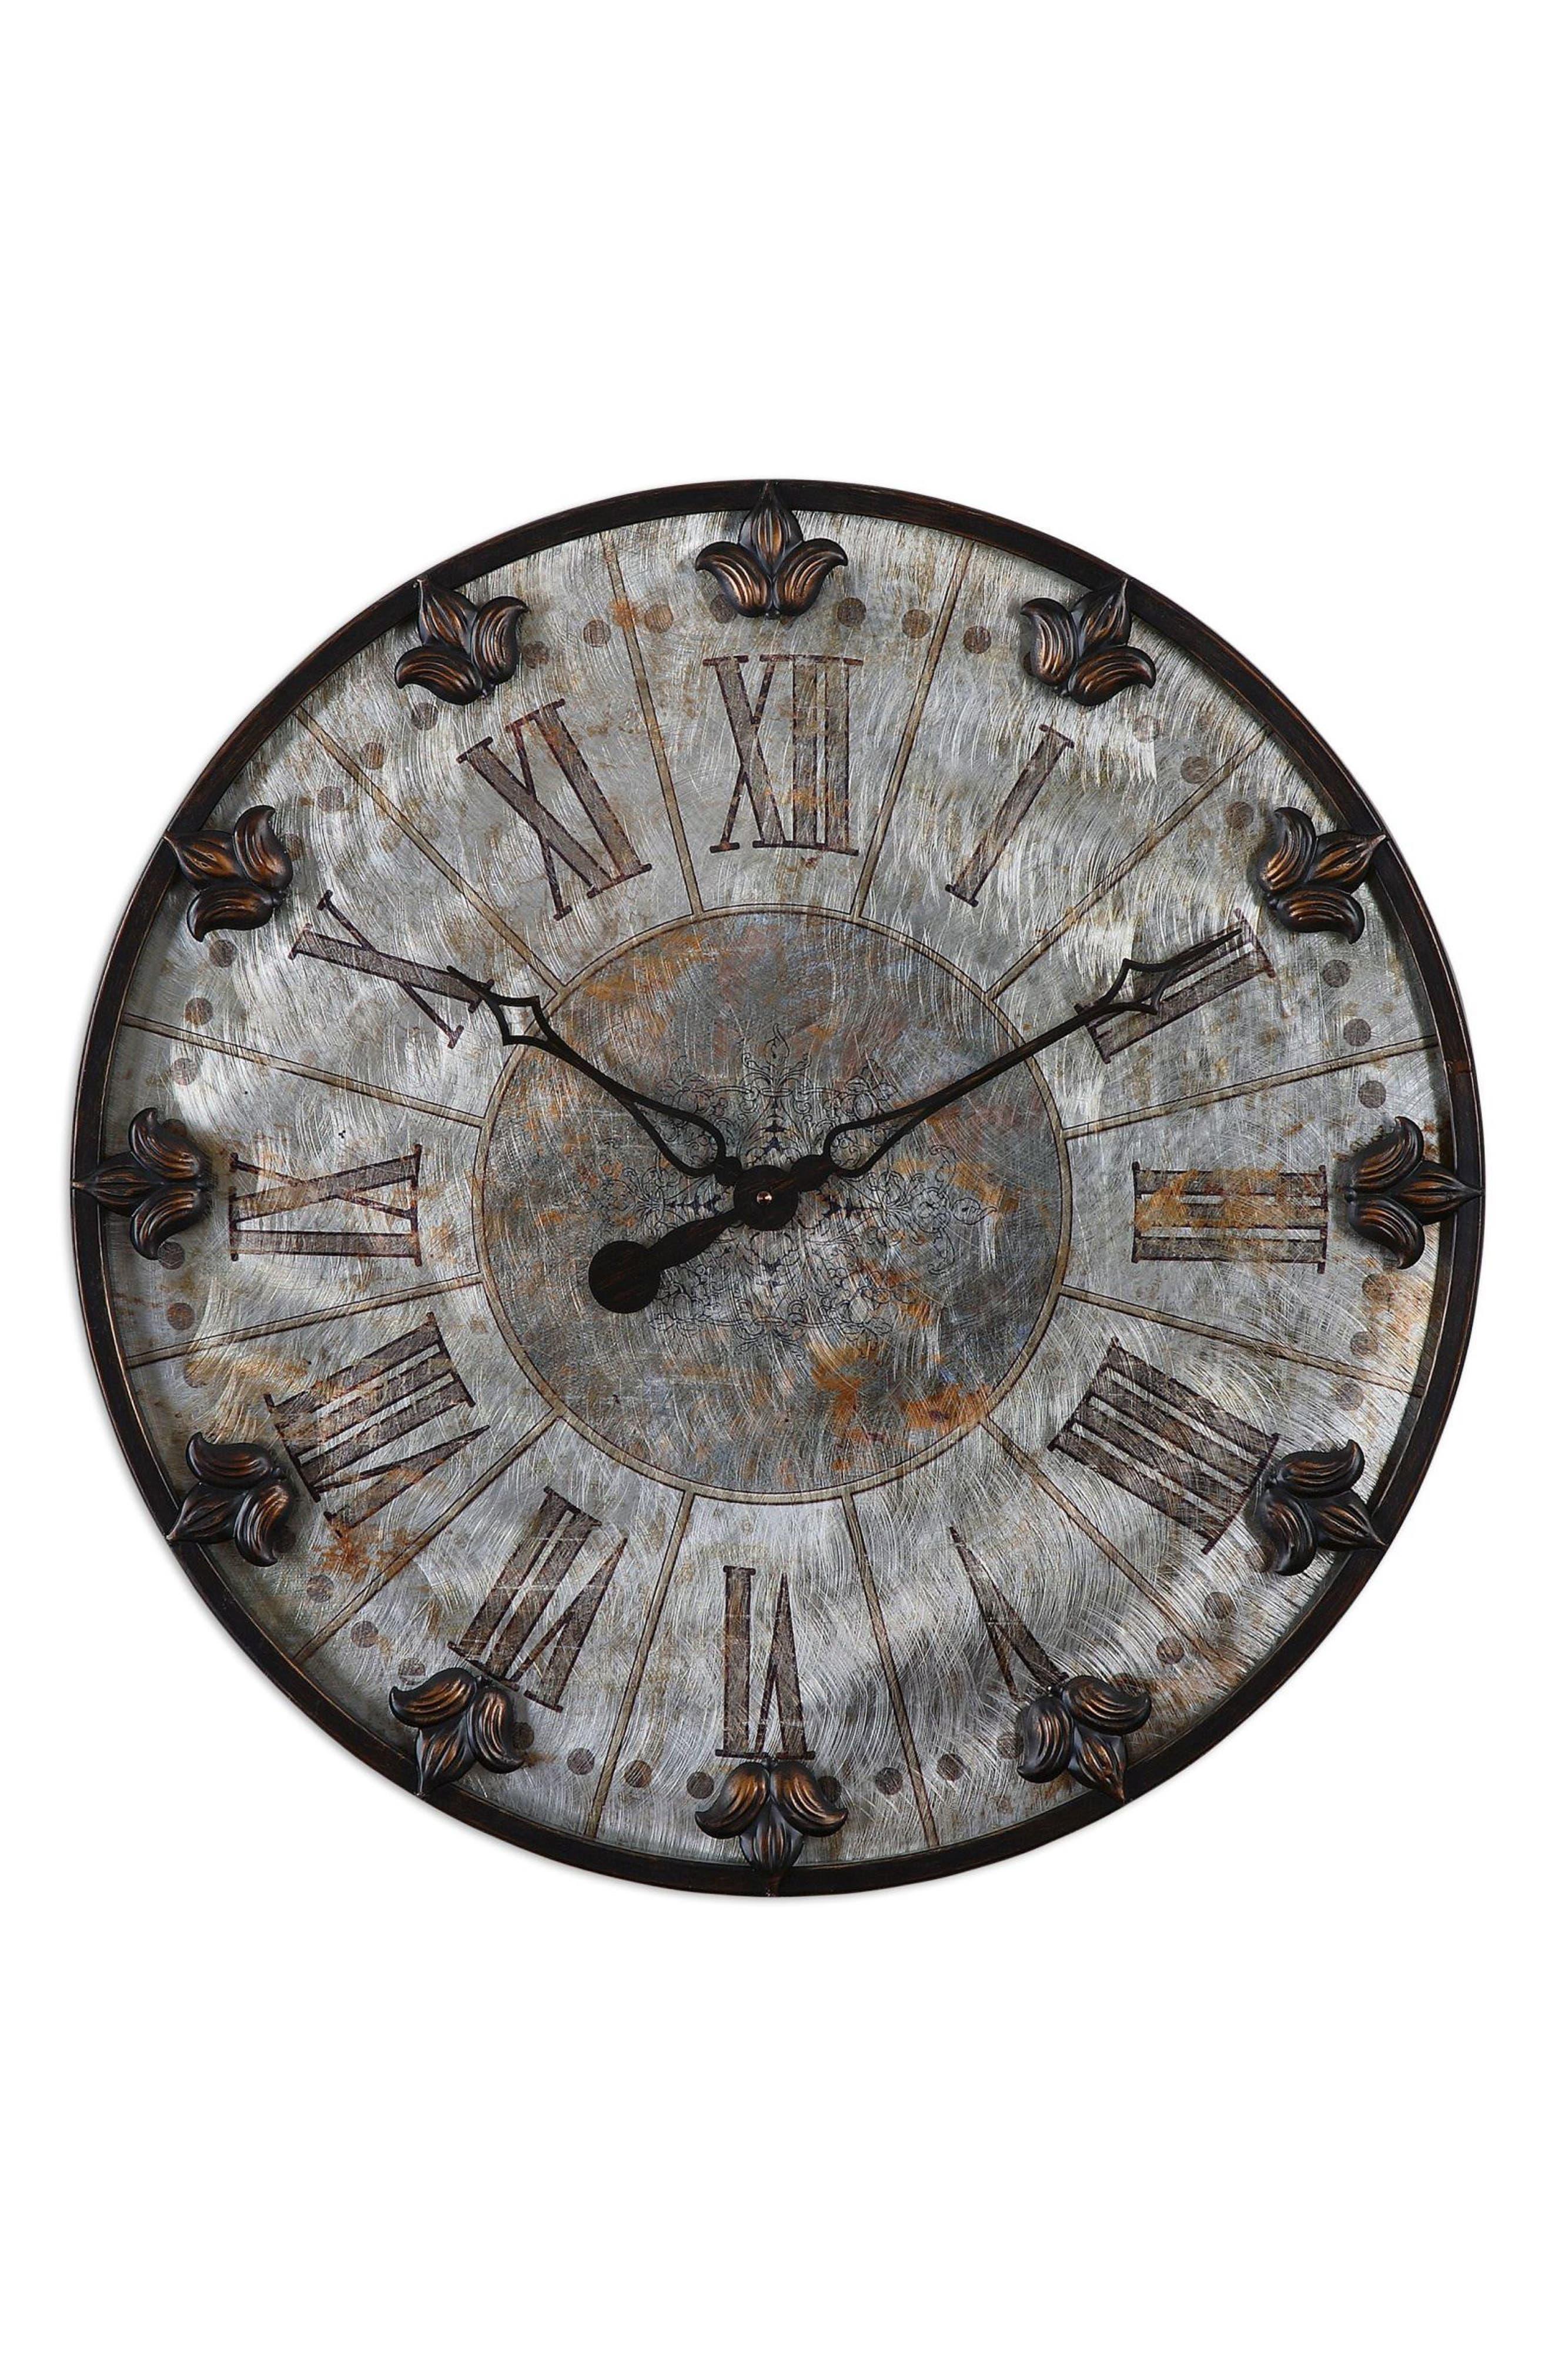 Artemis Wall Clock,                             Main thumbnail 1, color,                             Metallic Rust/ Copper